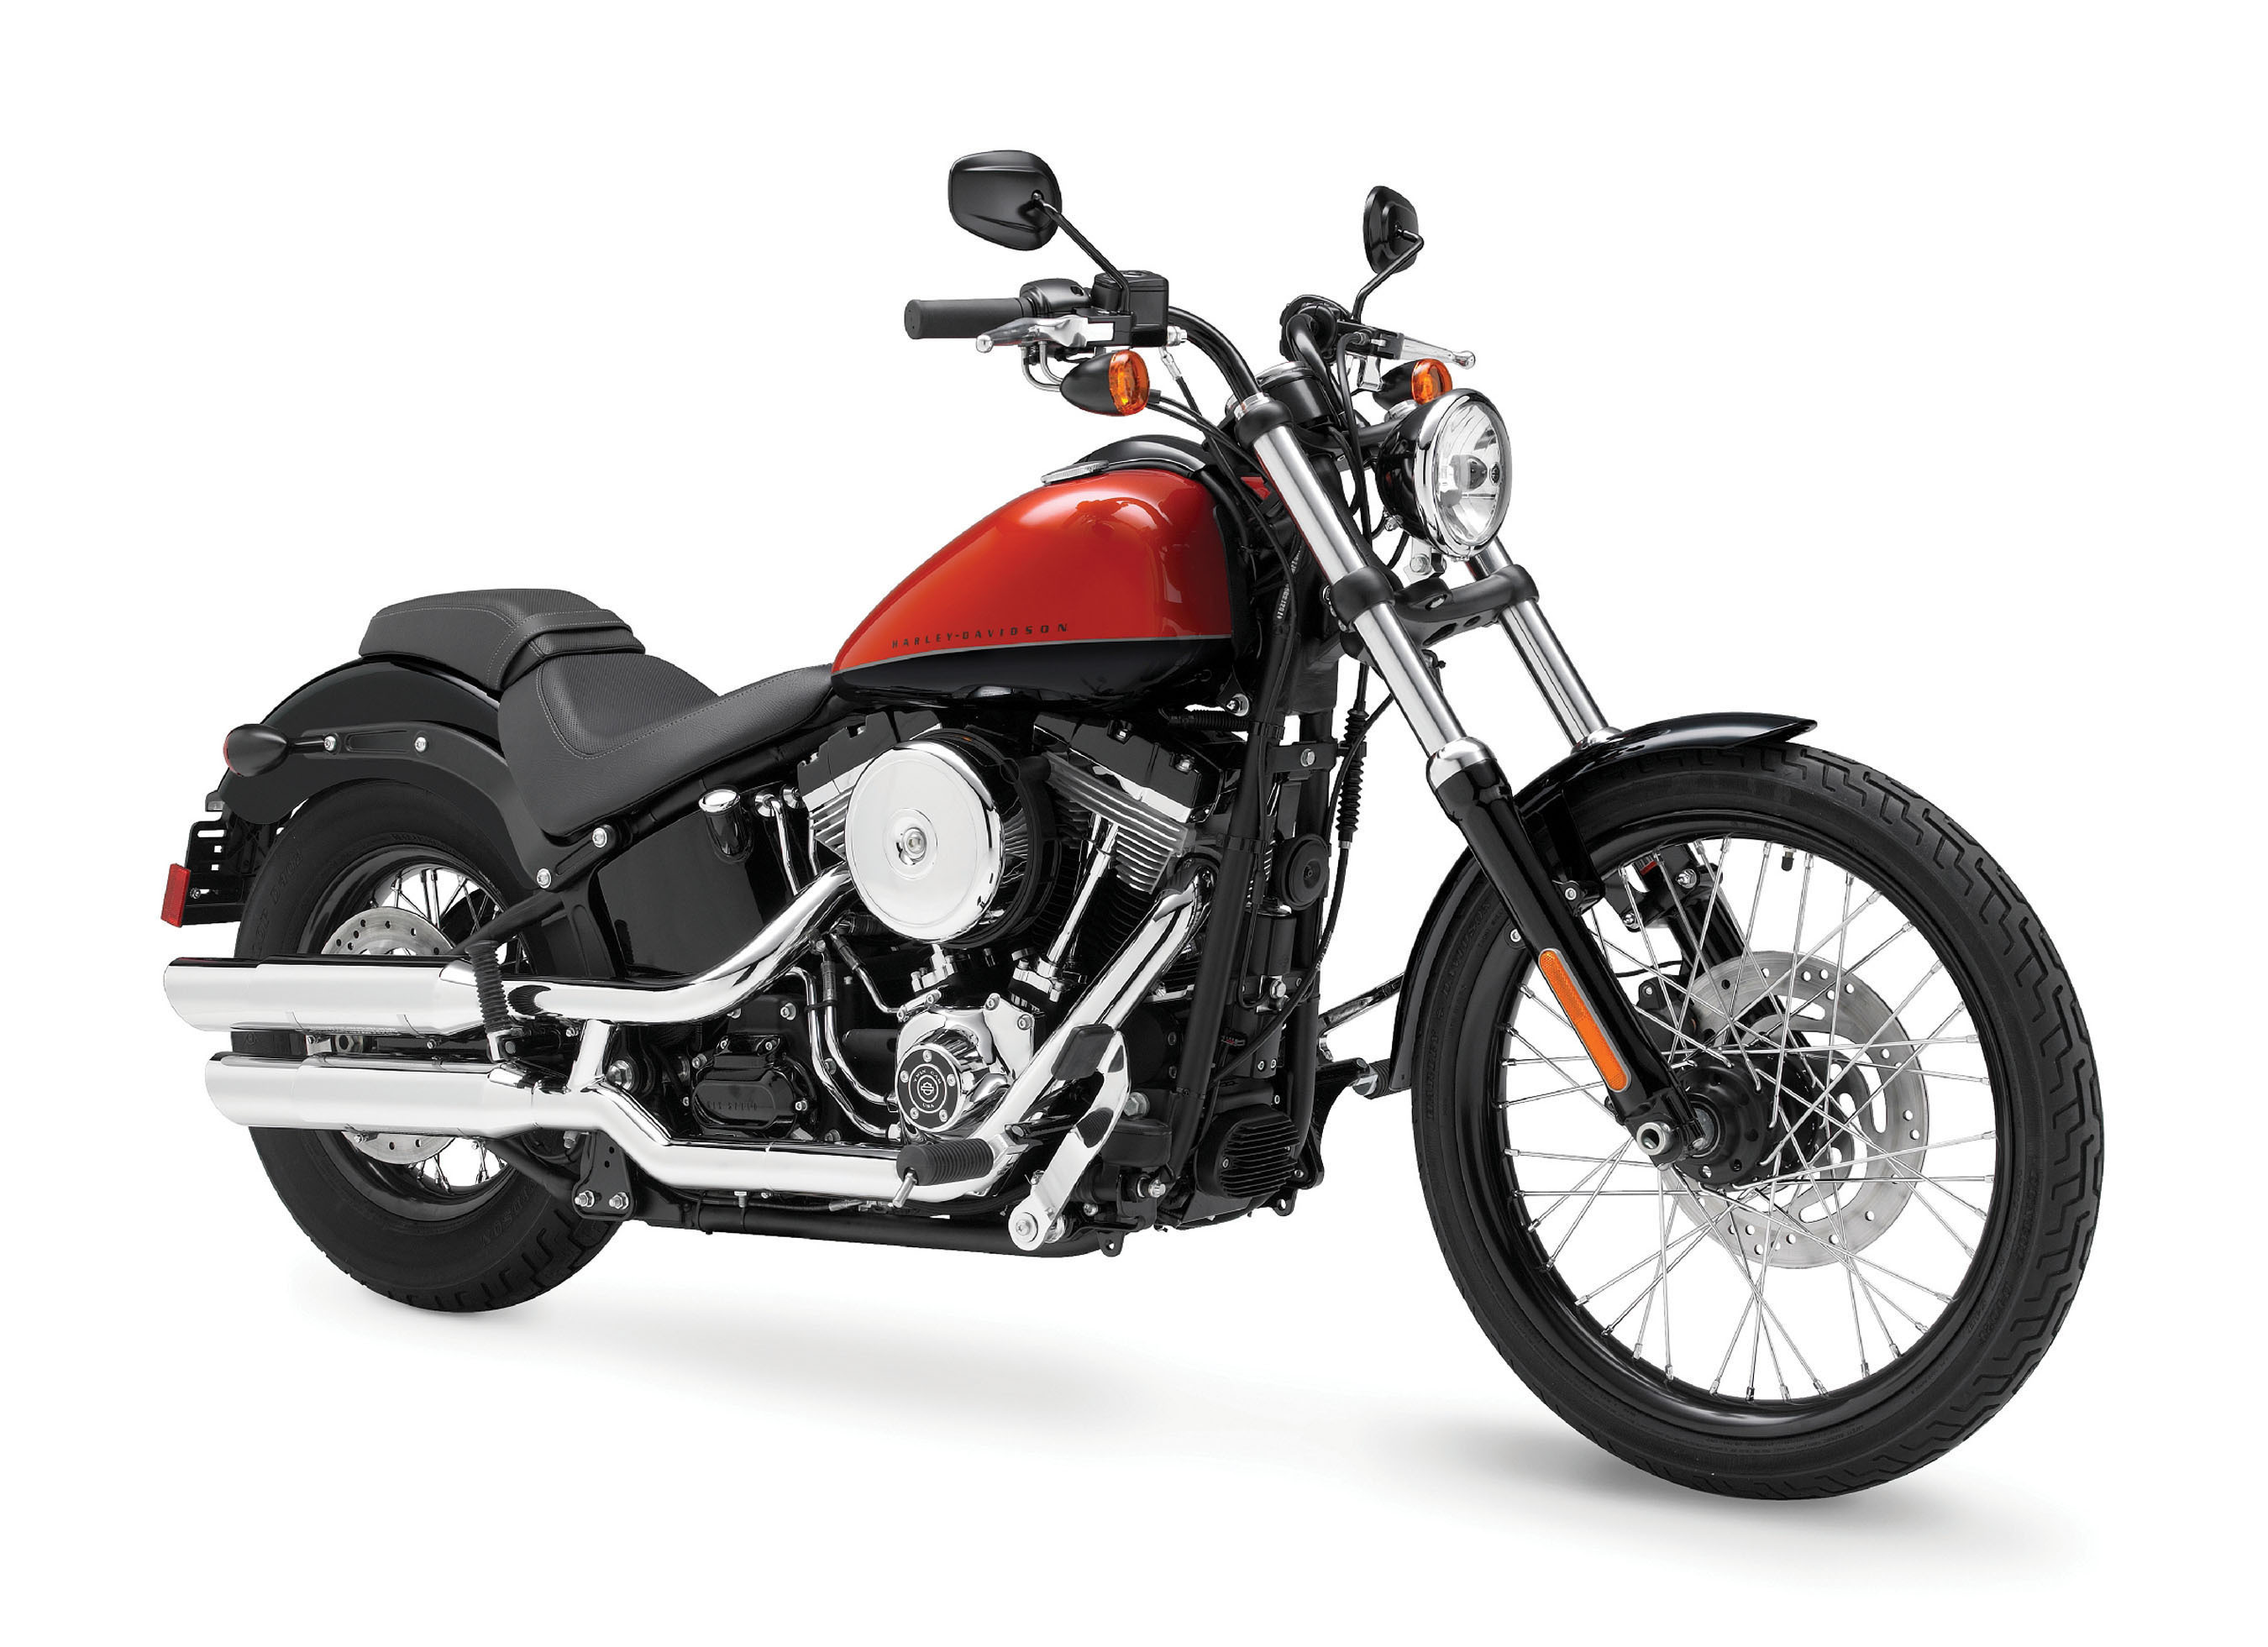 The new Harley-Davidson Blackline motorcycle.  (PRNewsFoto/Harley-Davidson Motor Company)